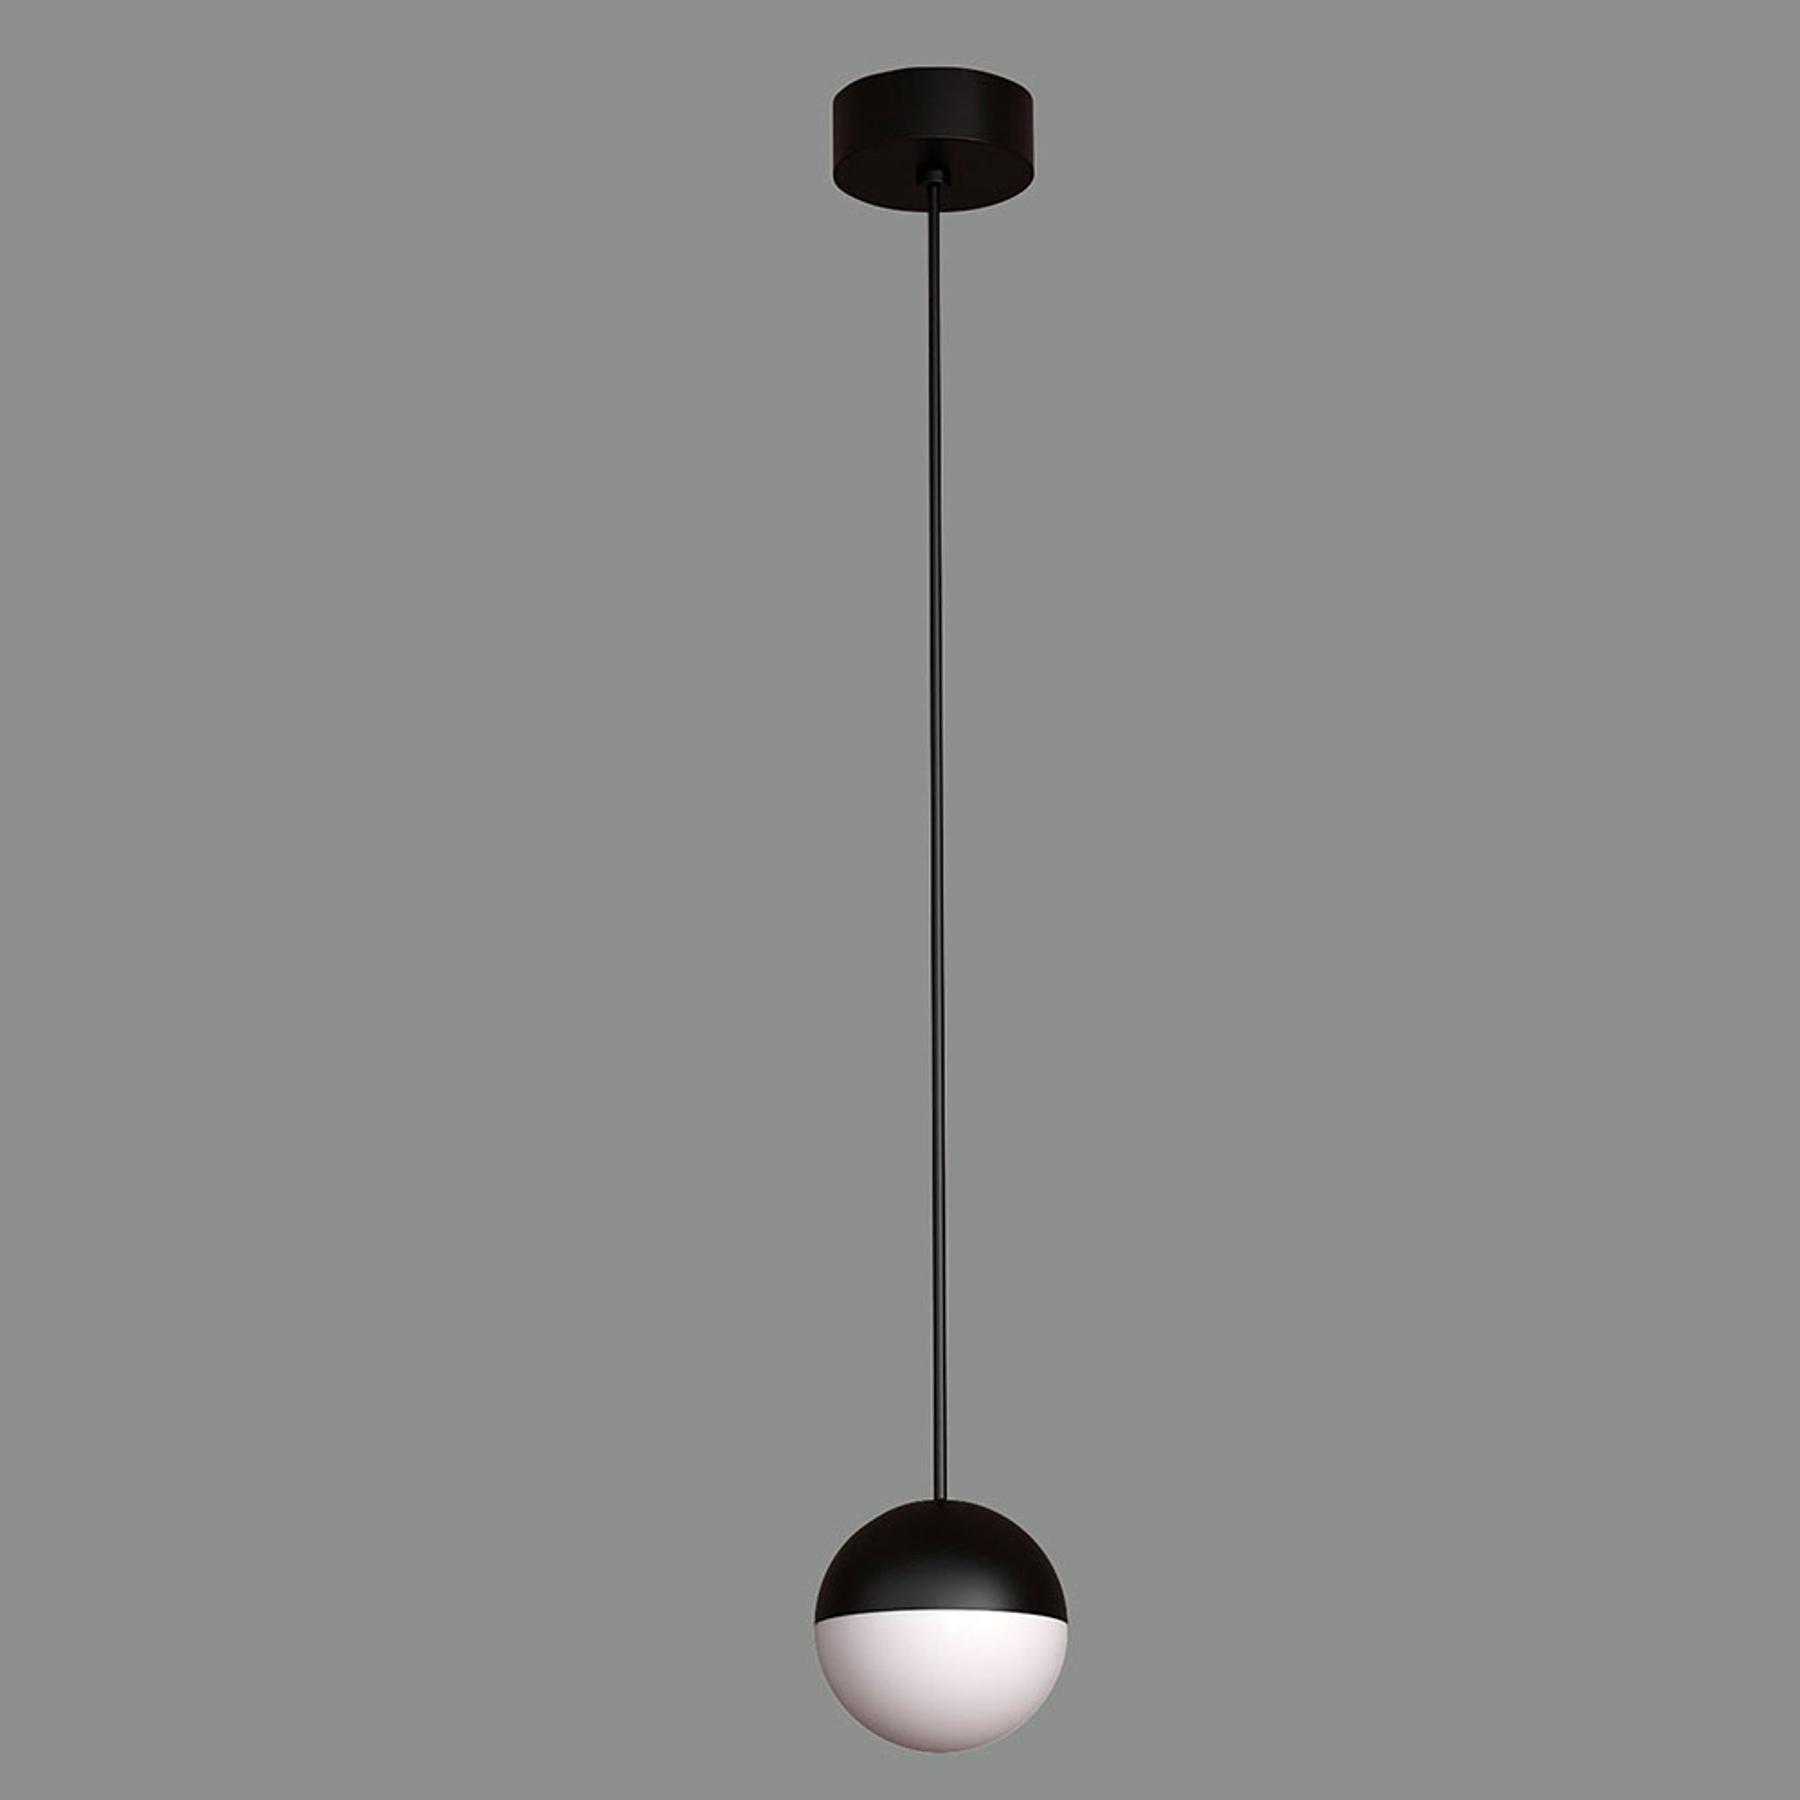 Lampa wisząca LED Custo, 1-punktowa